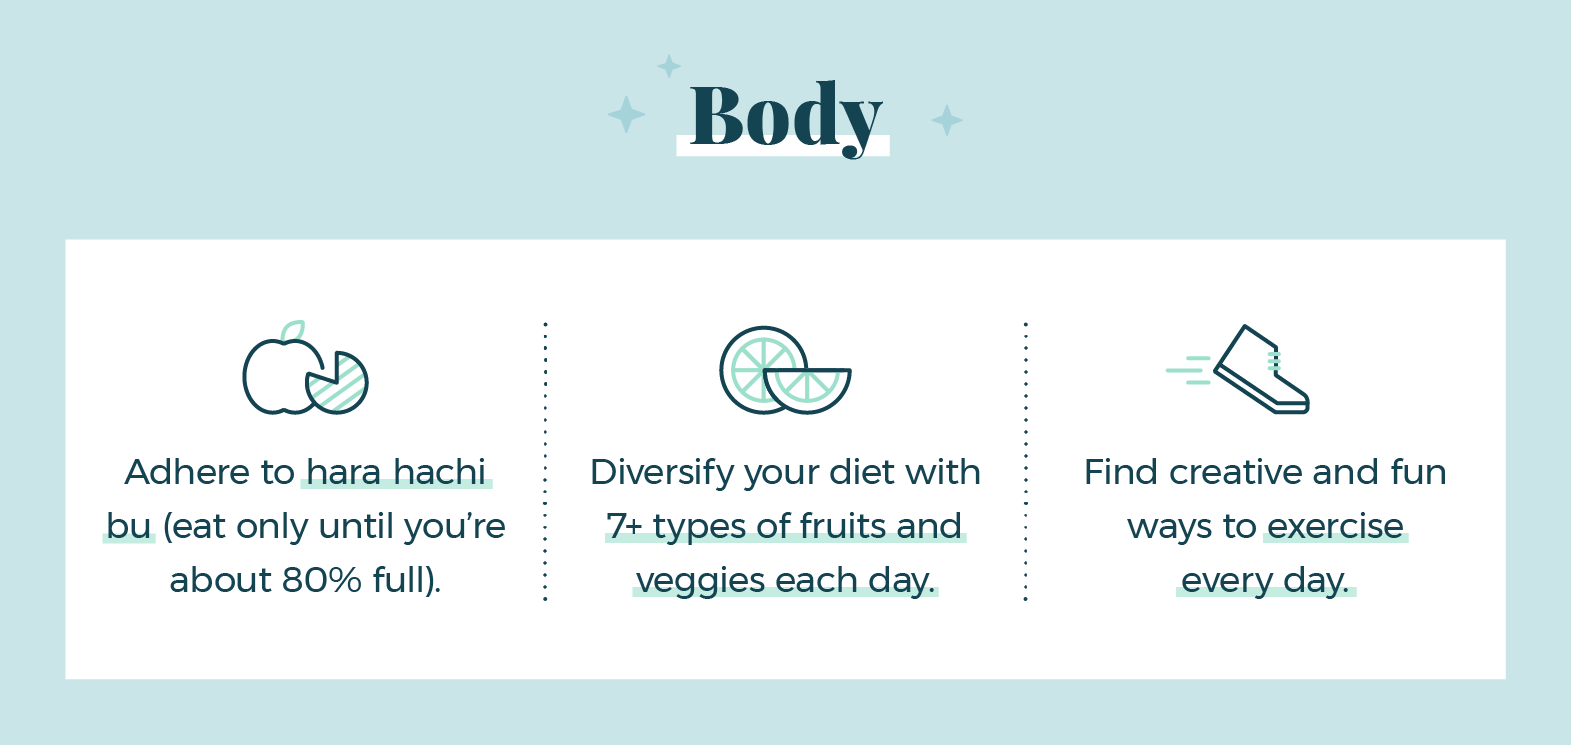 charcteristics-of-everyday-ikigai-body